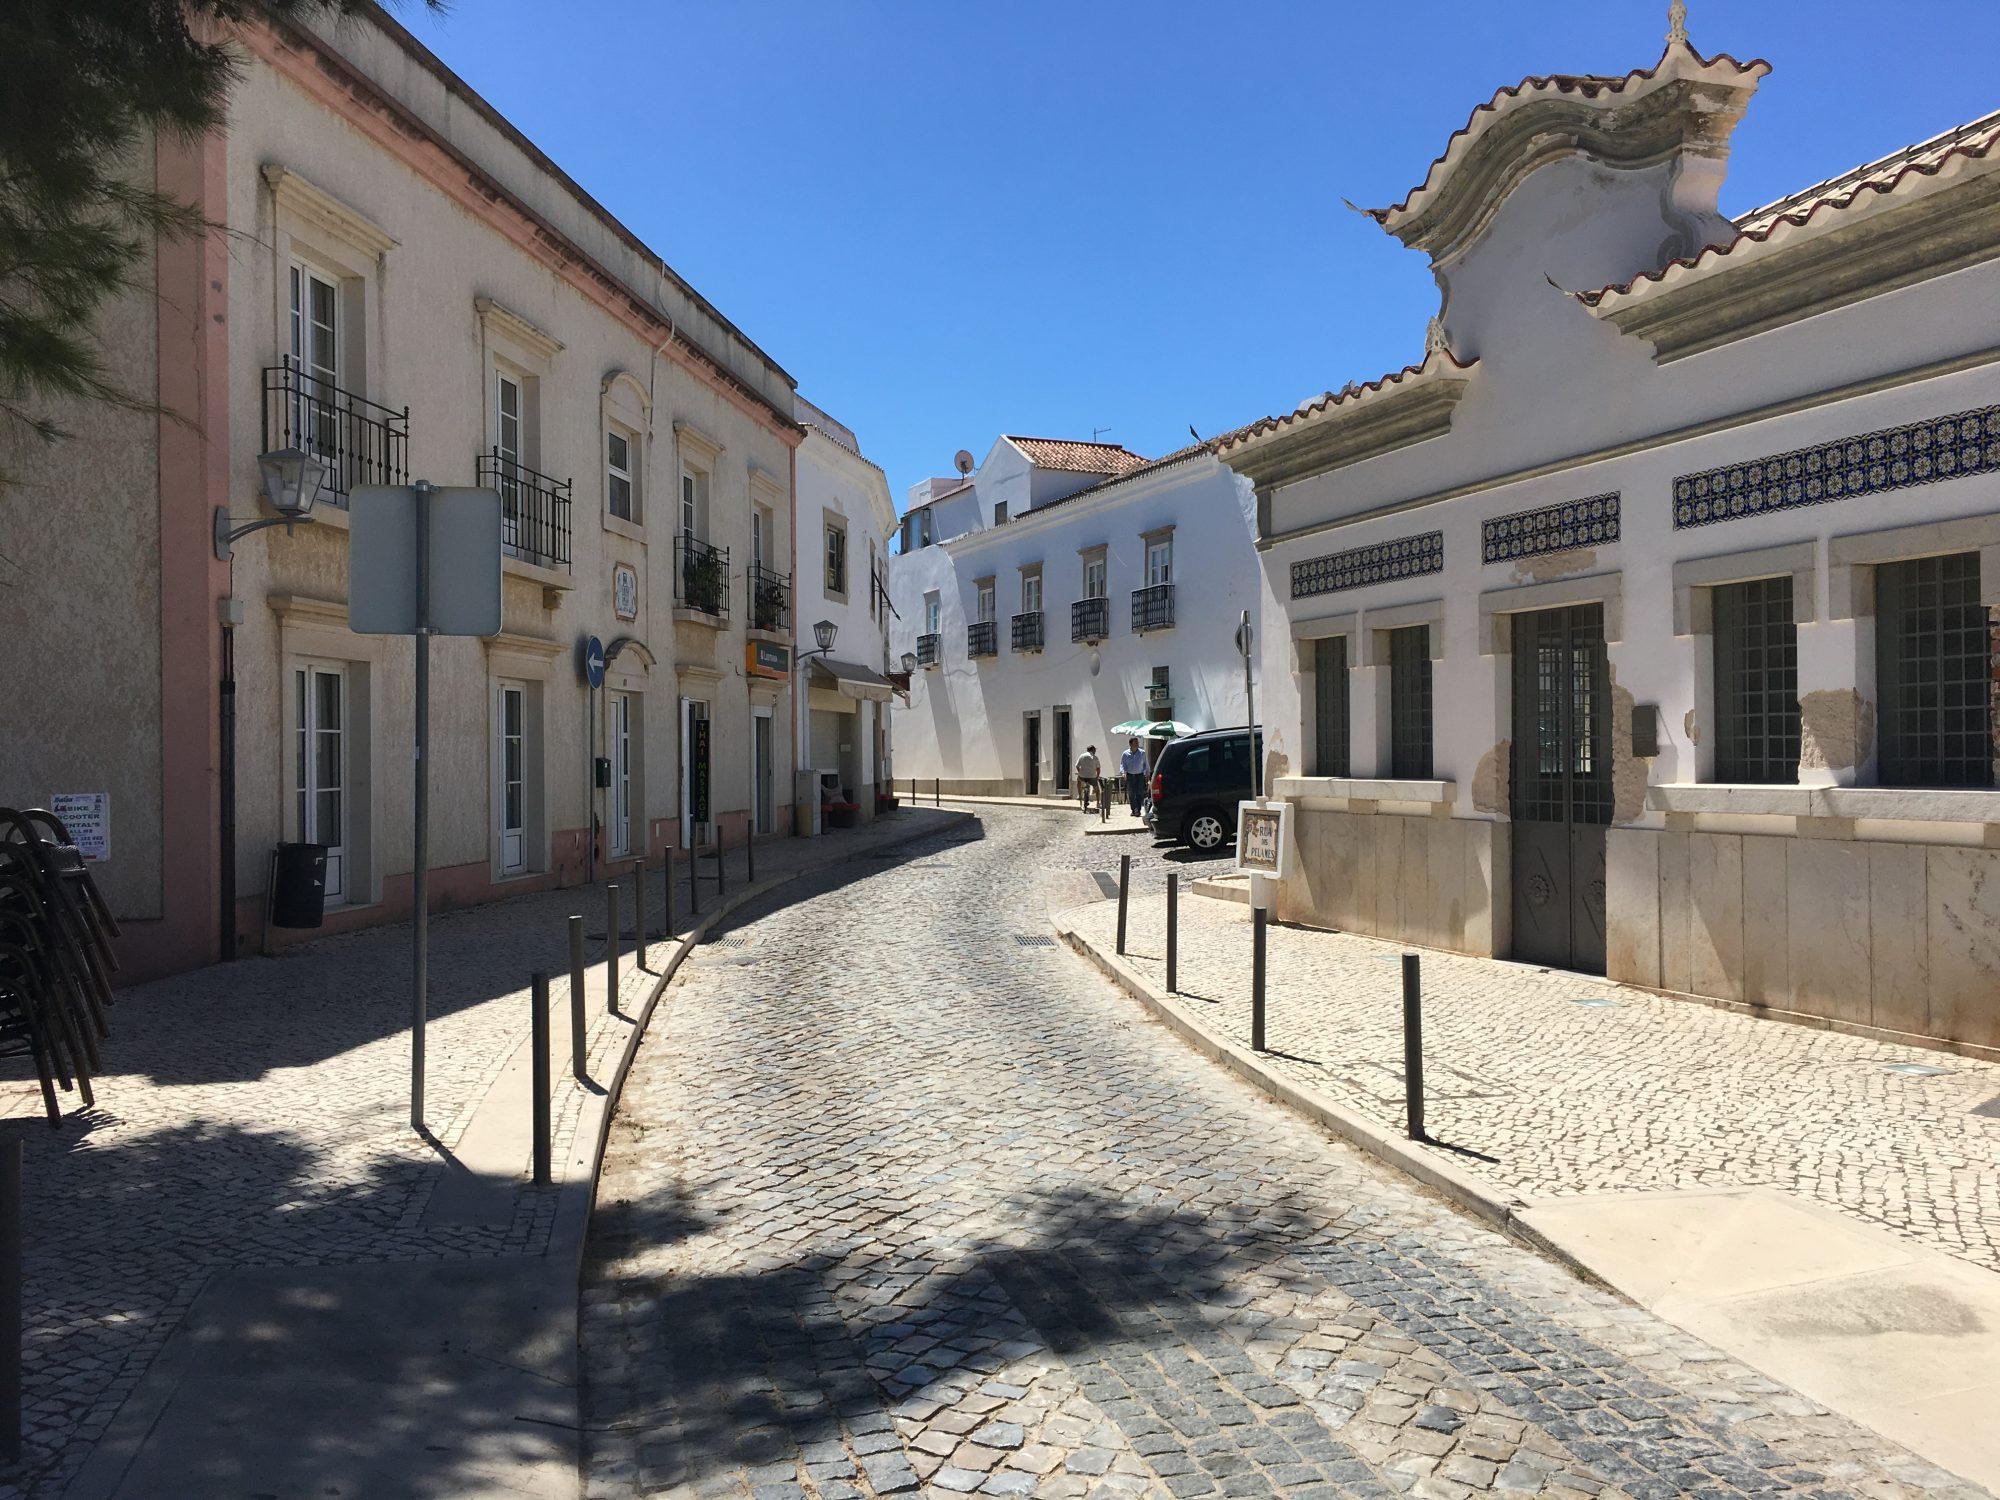 Cobblestone streets in Tavira